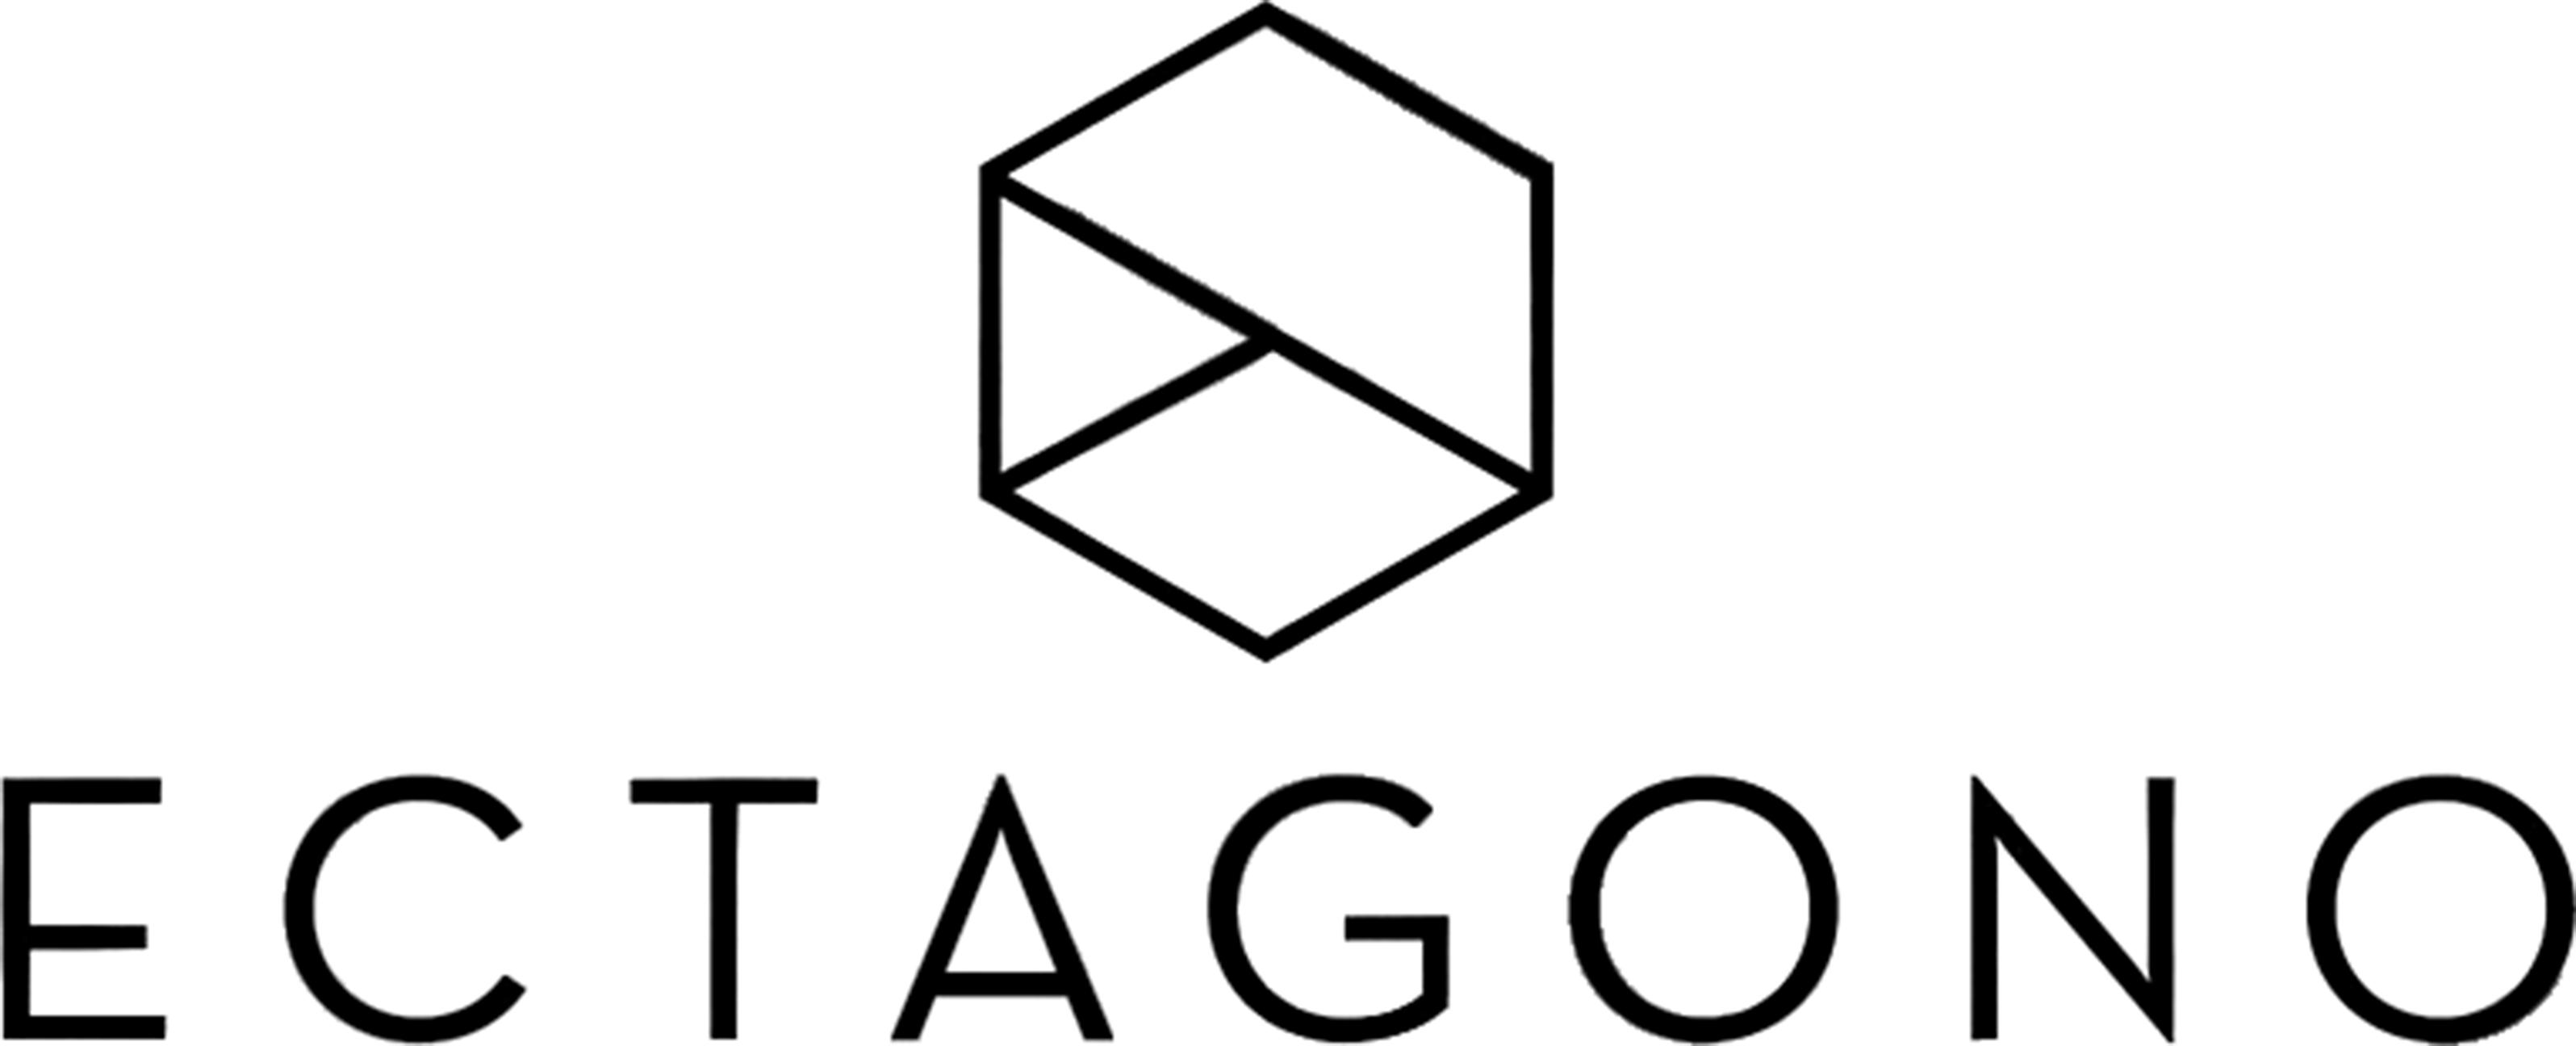 Ectagono